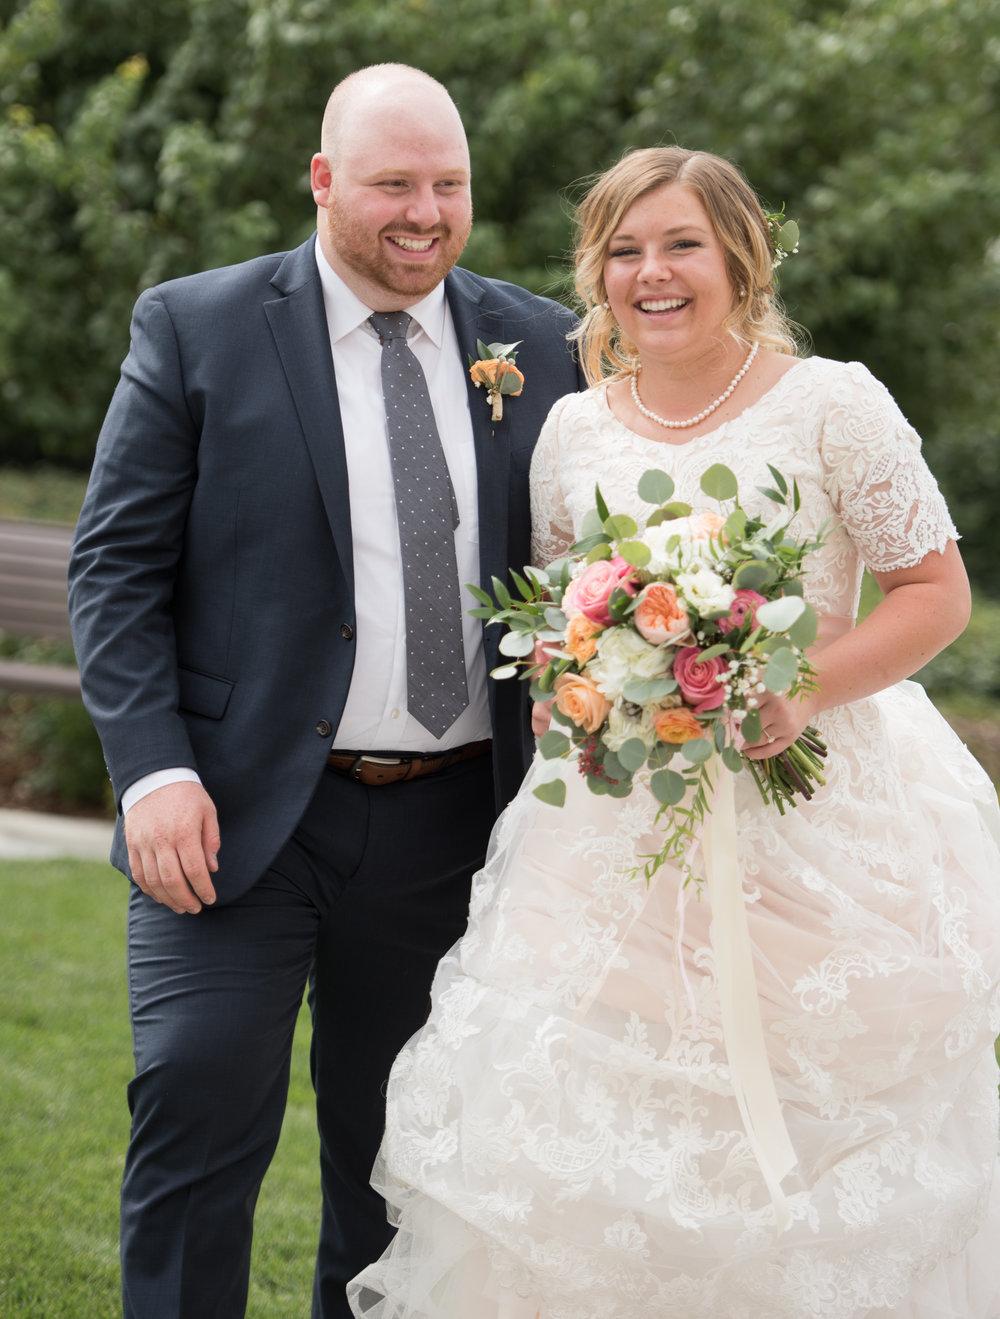 SC-Kylee wedding-9853.jpg